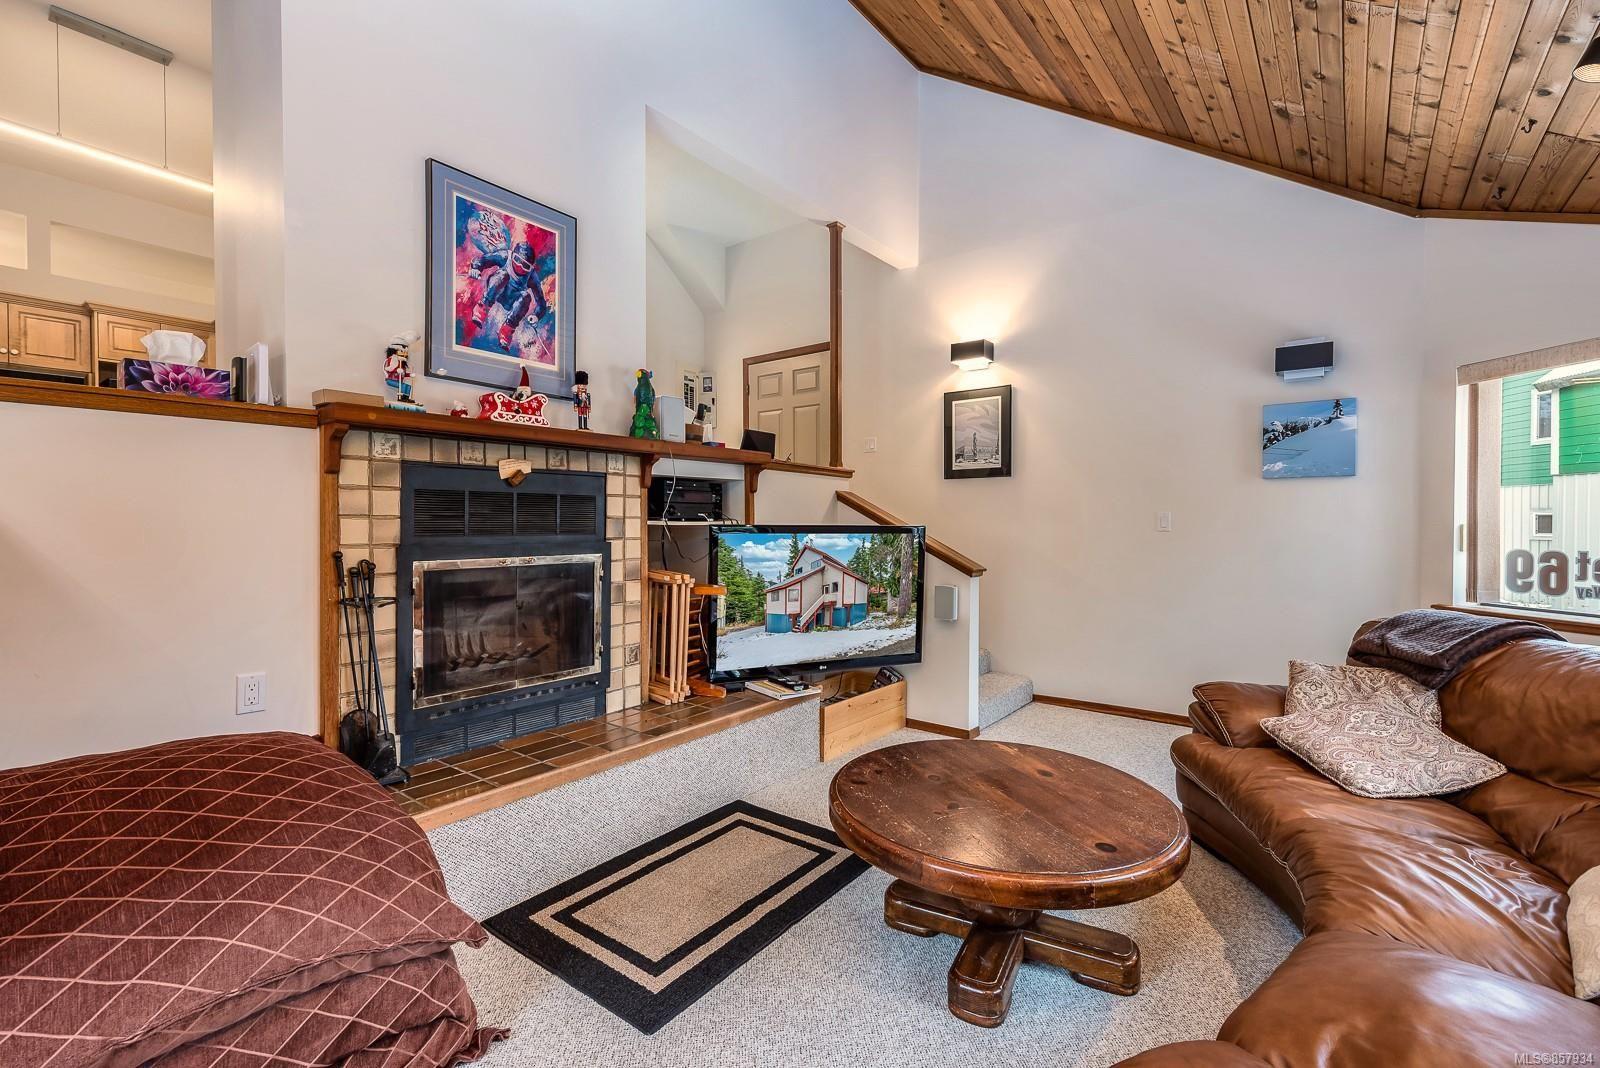 Photo 8: Photos: 998 STRATA Way in : CV Mt Washington House for sale (Comox Valley)  : MLS®# 857934